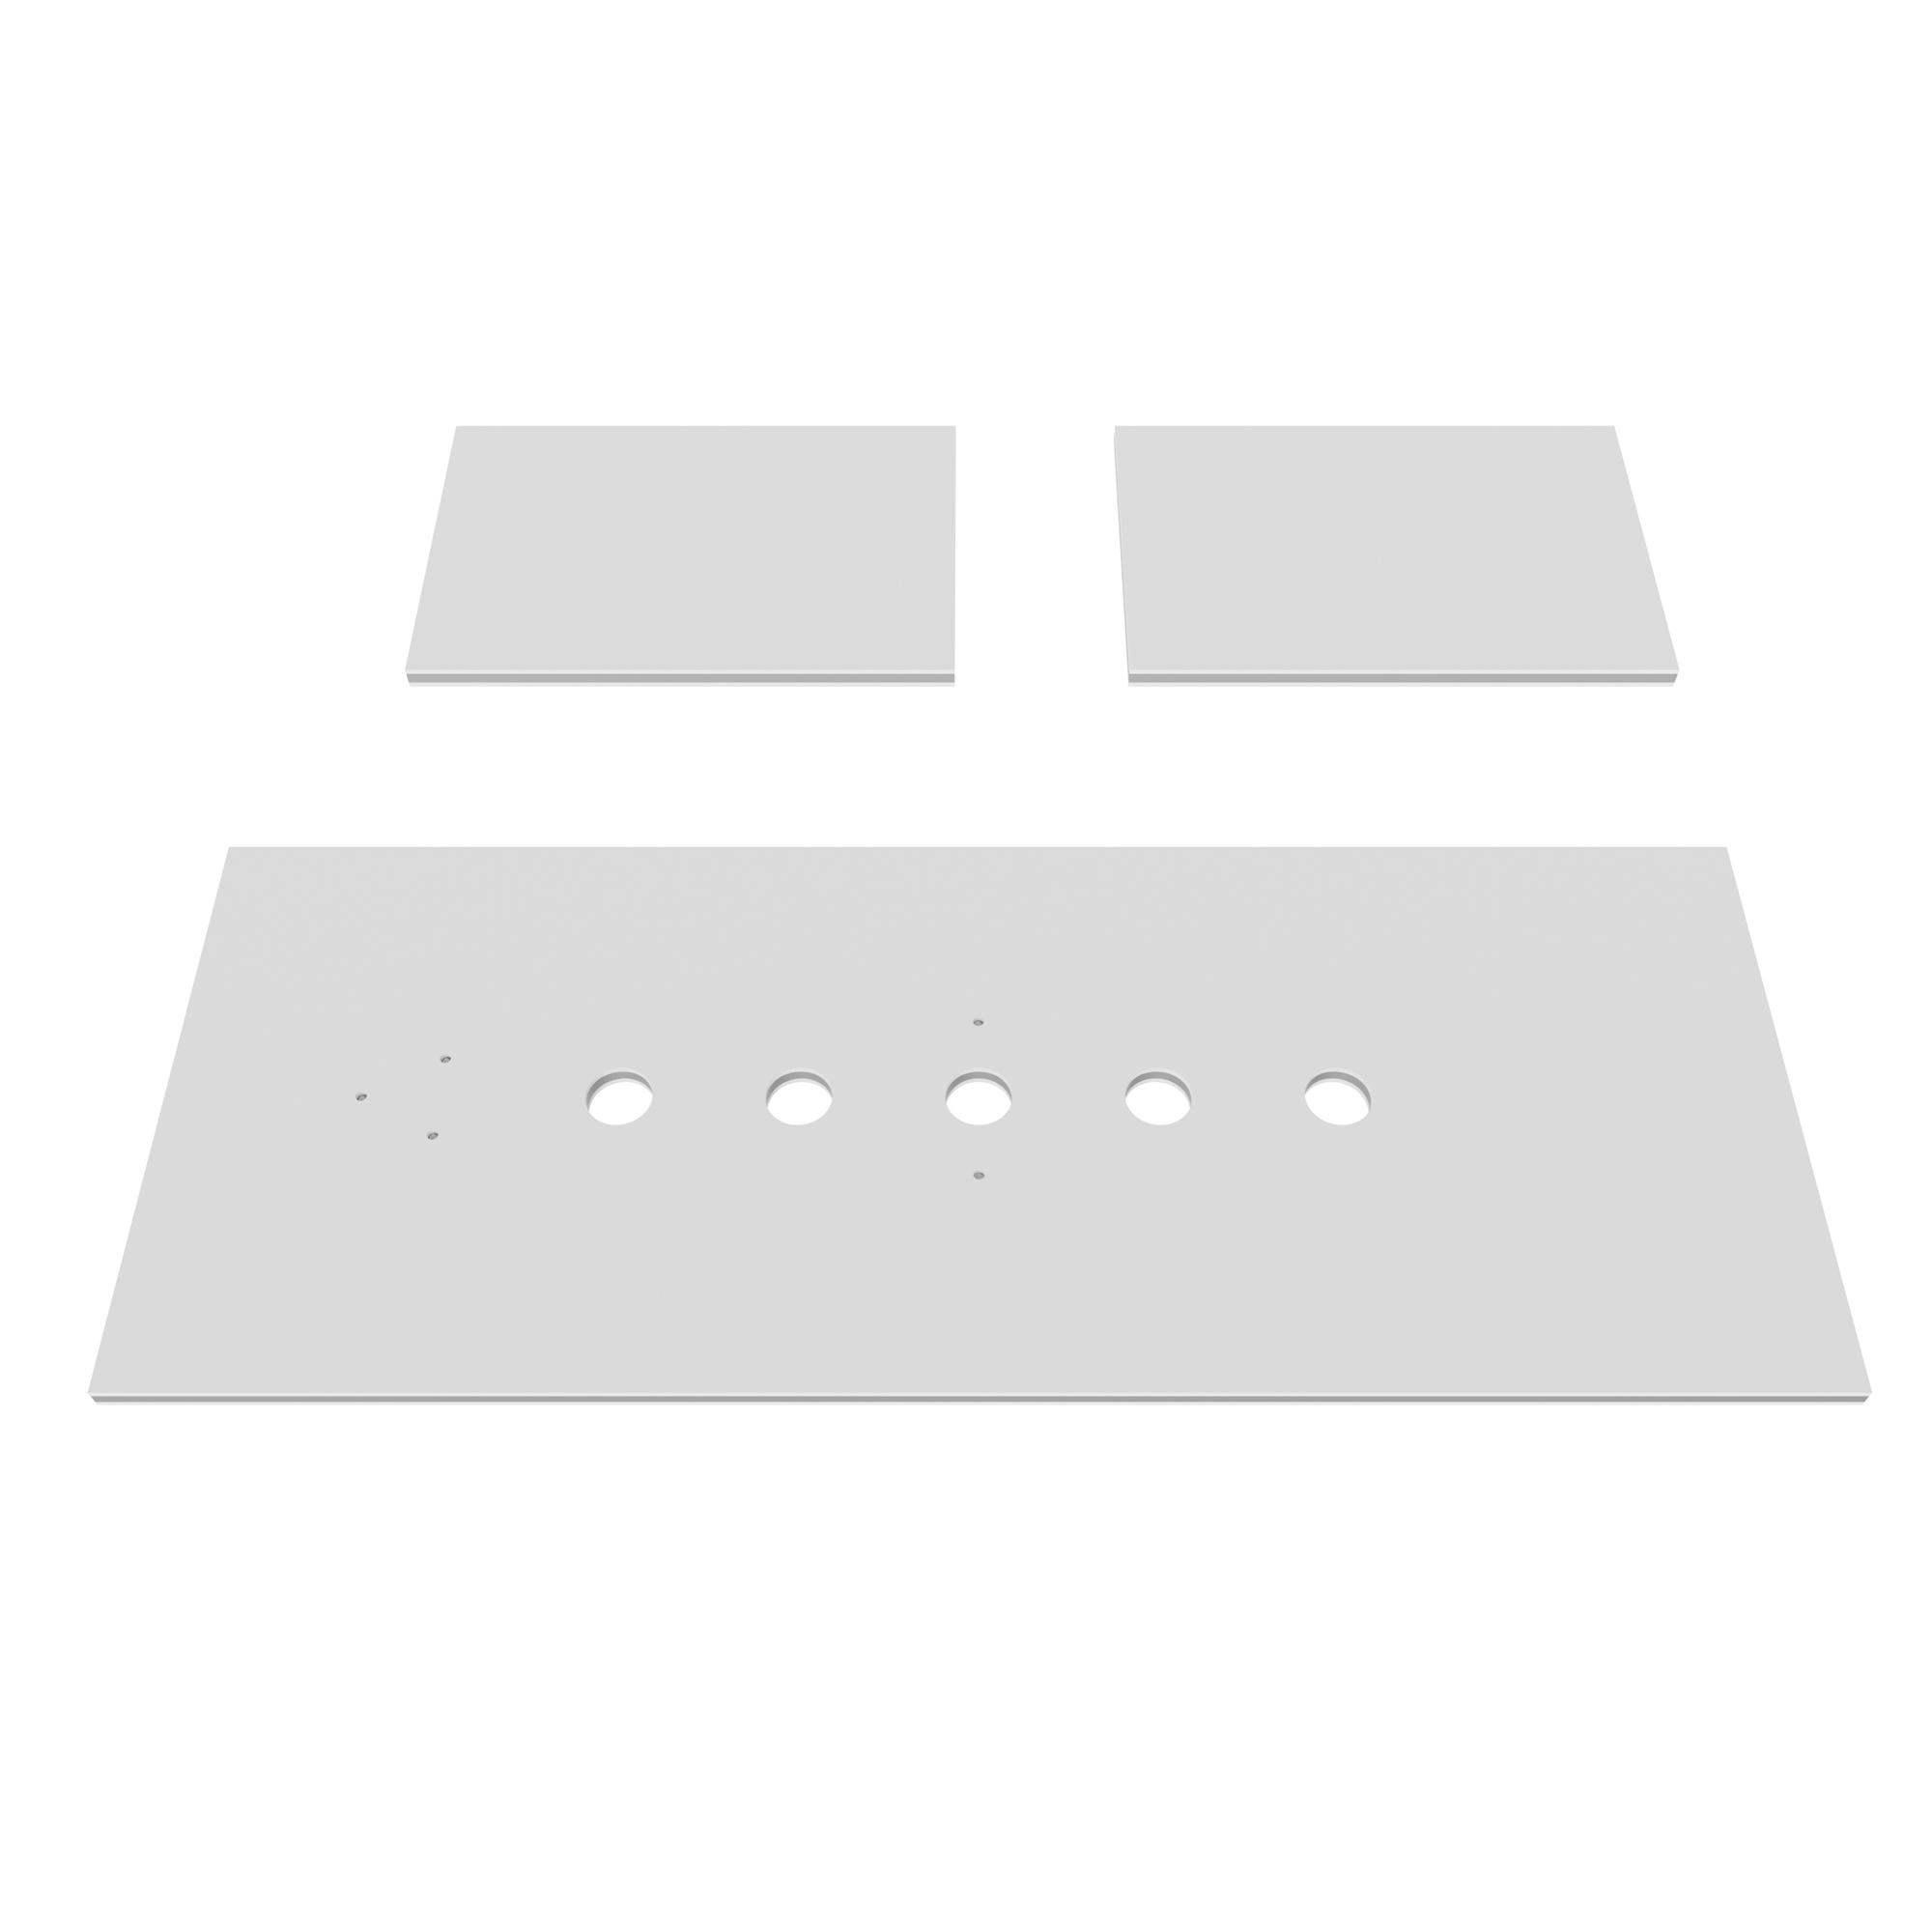 Pro-RF GridAlign